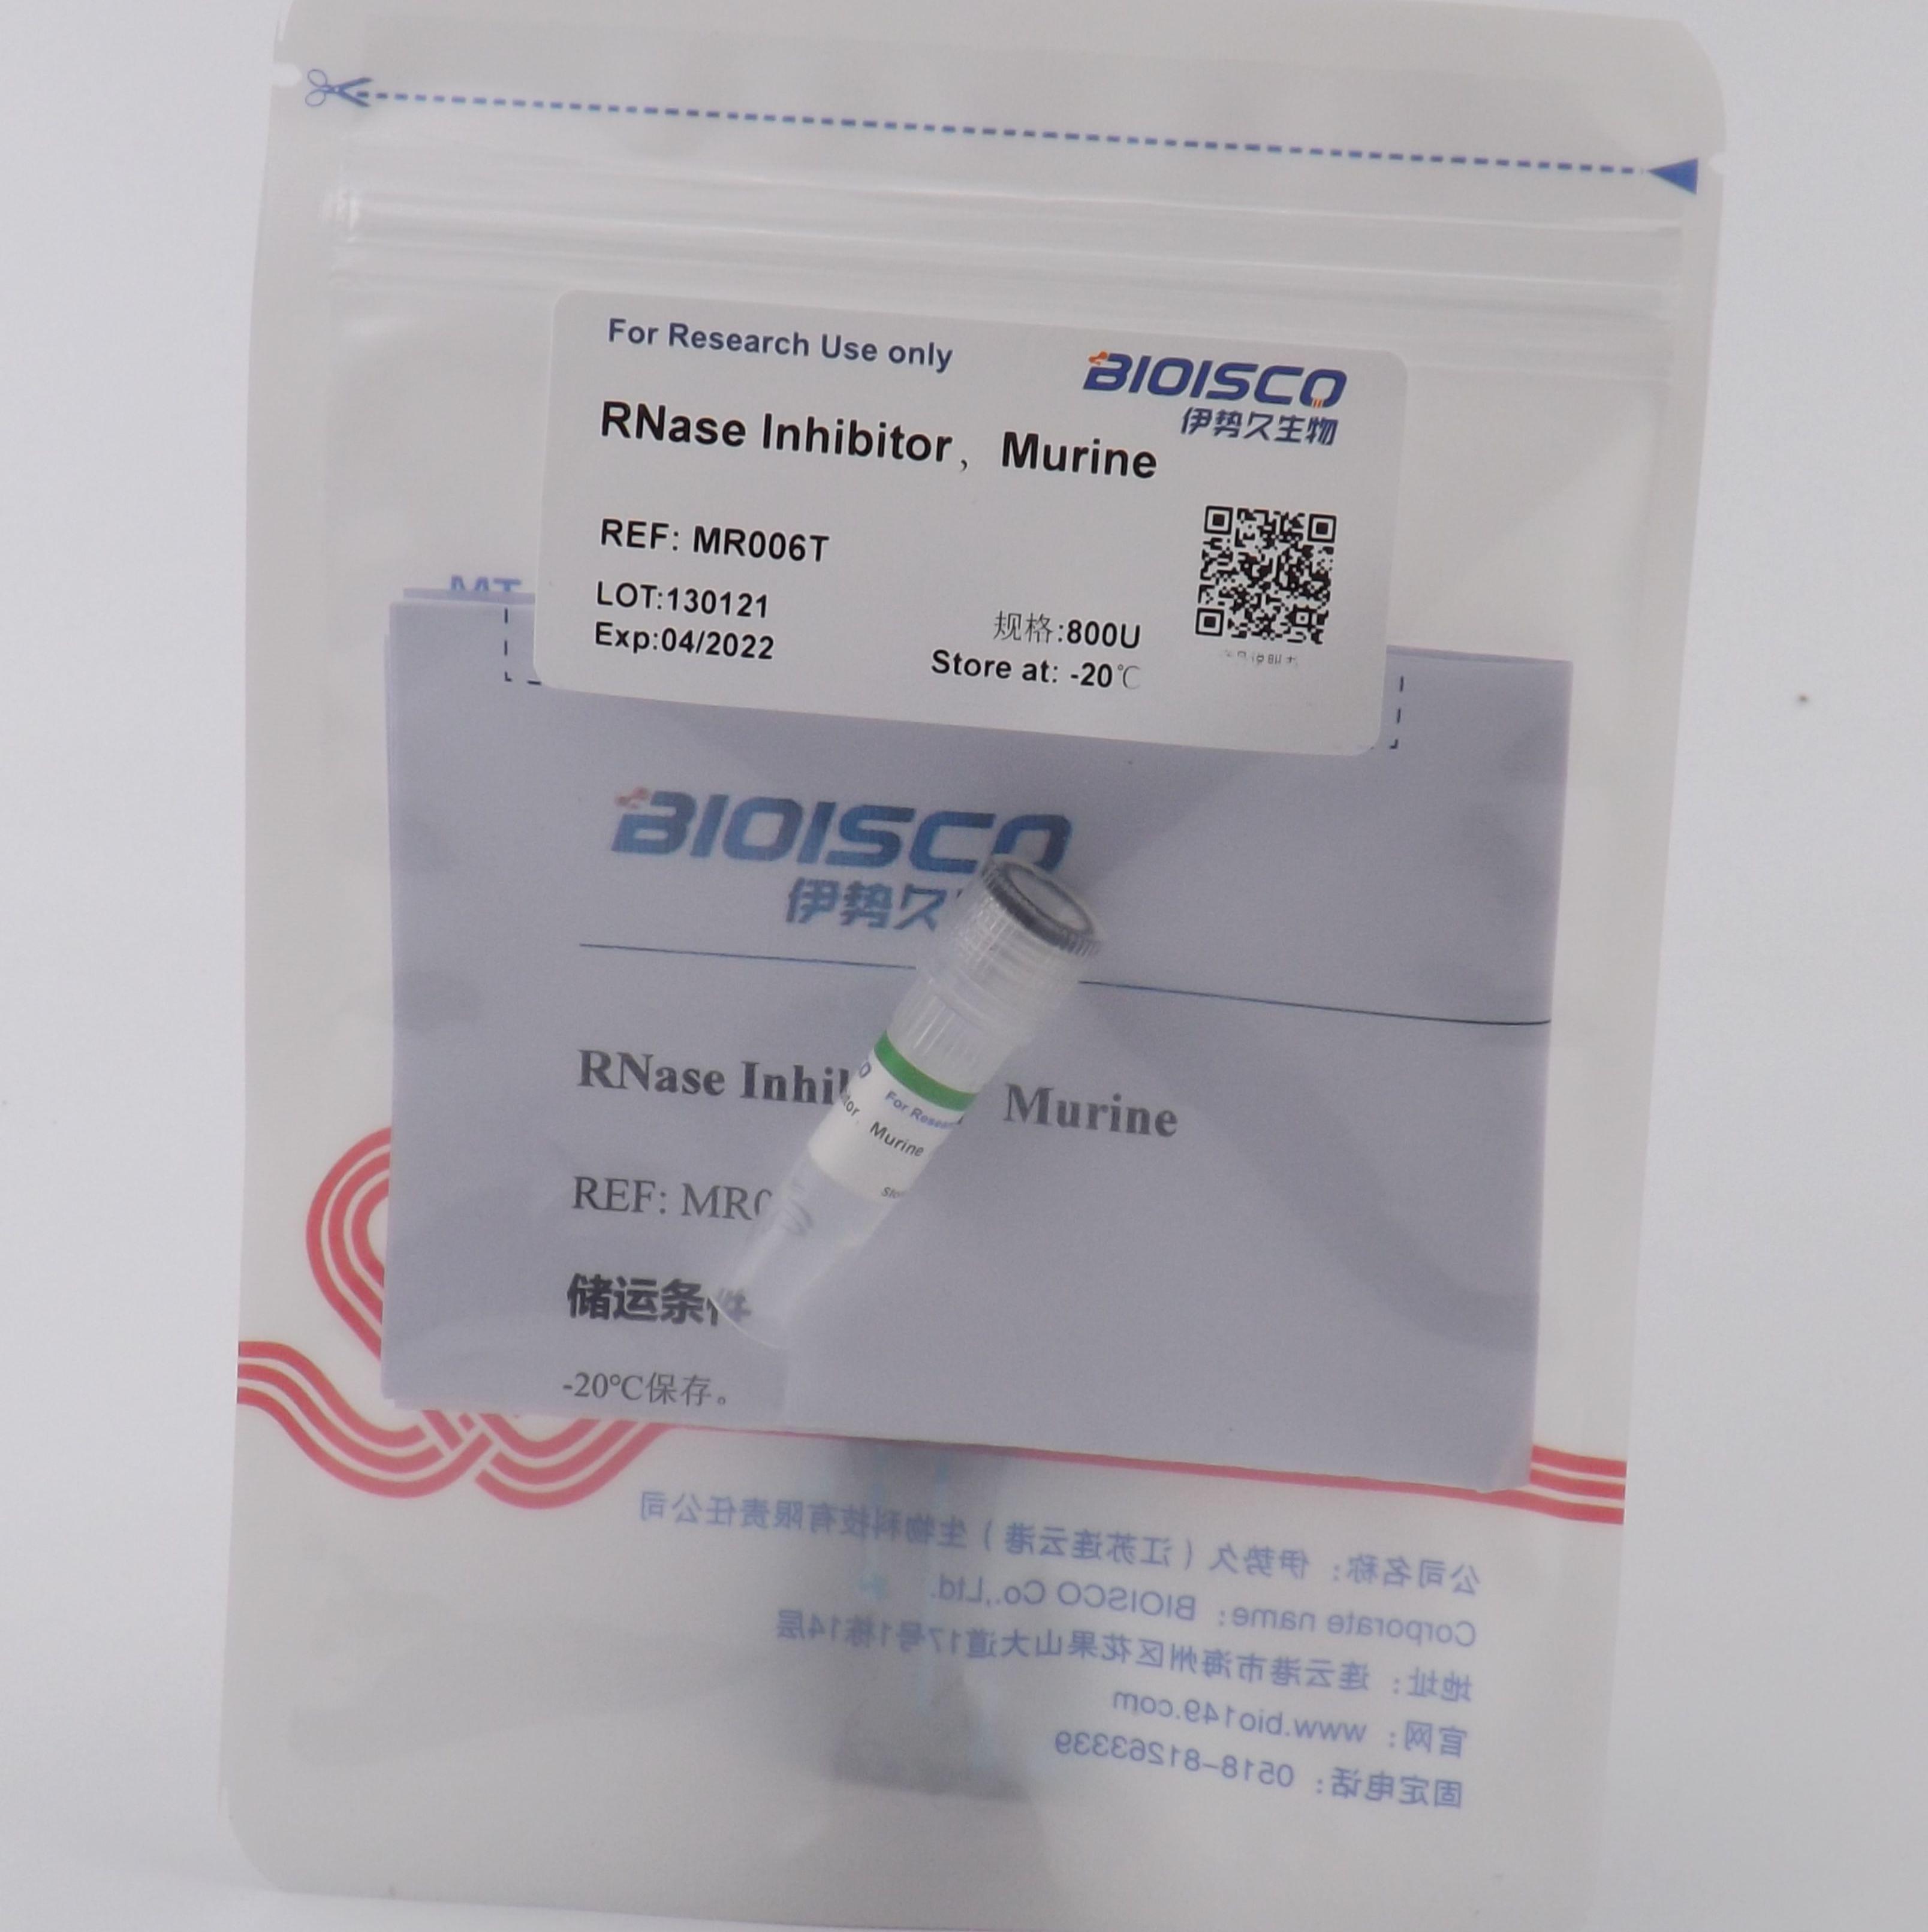 MR006-核酸酶抑制剂,鼠源重组